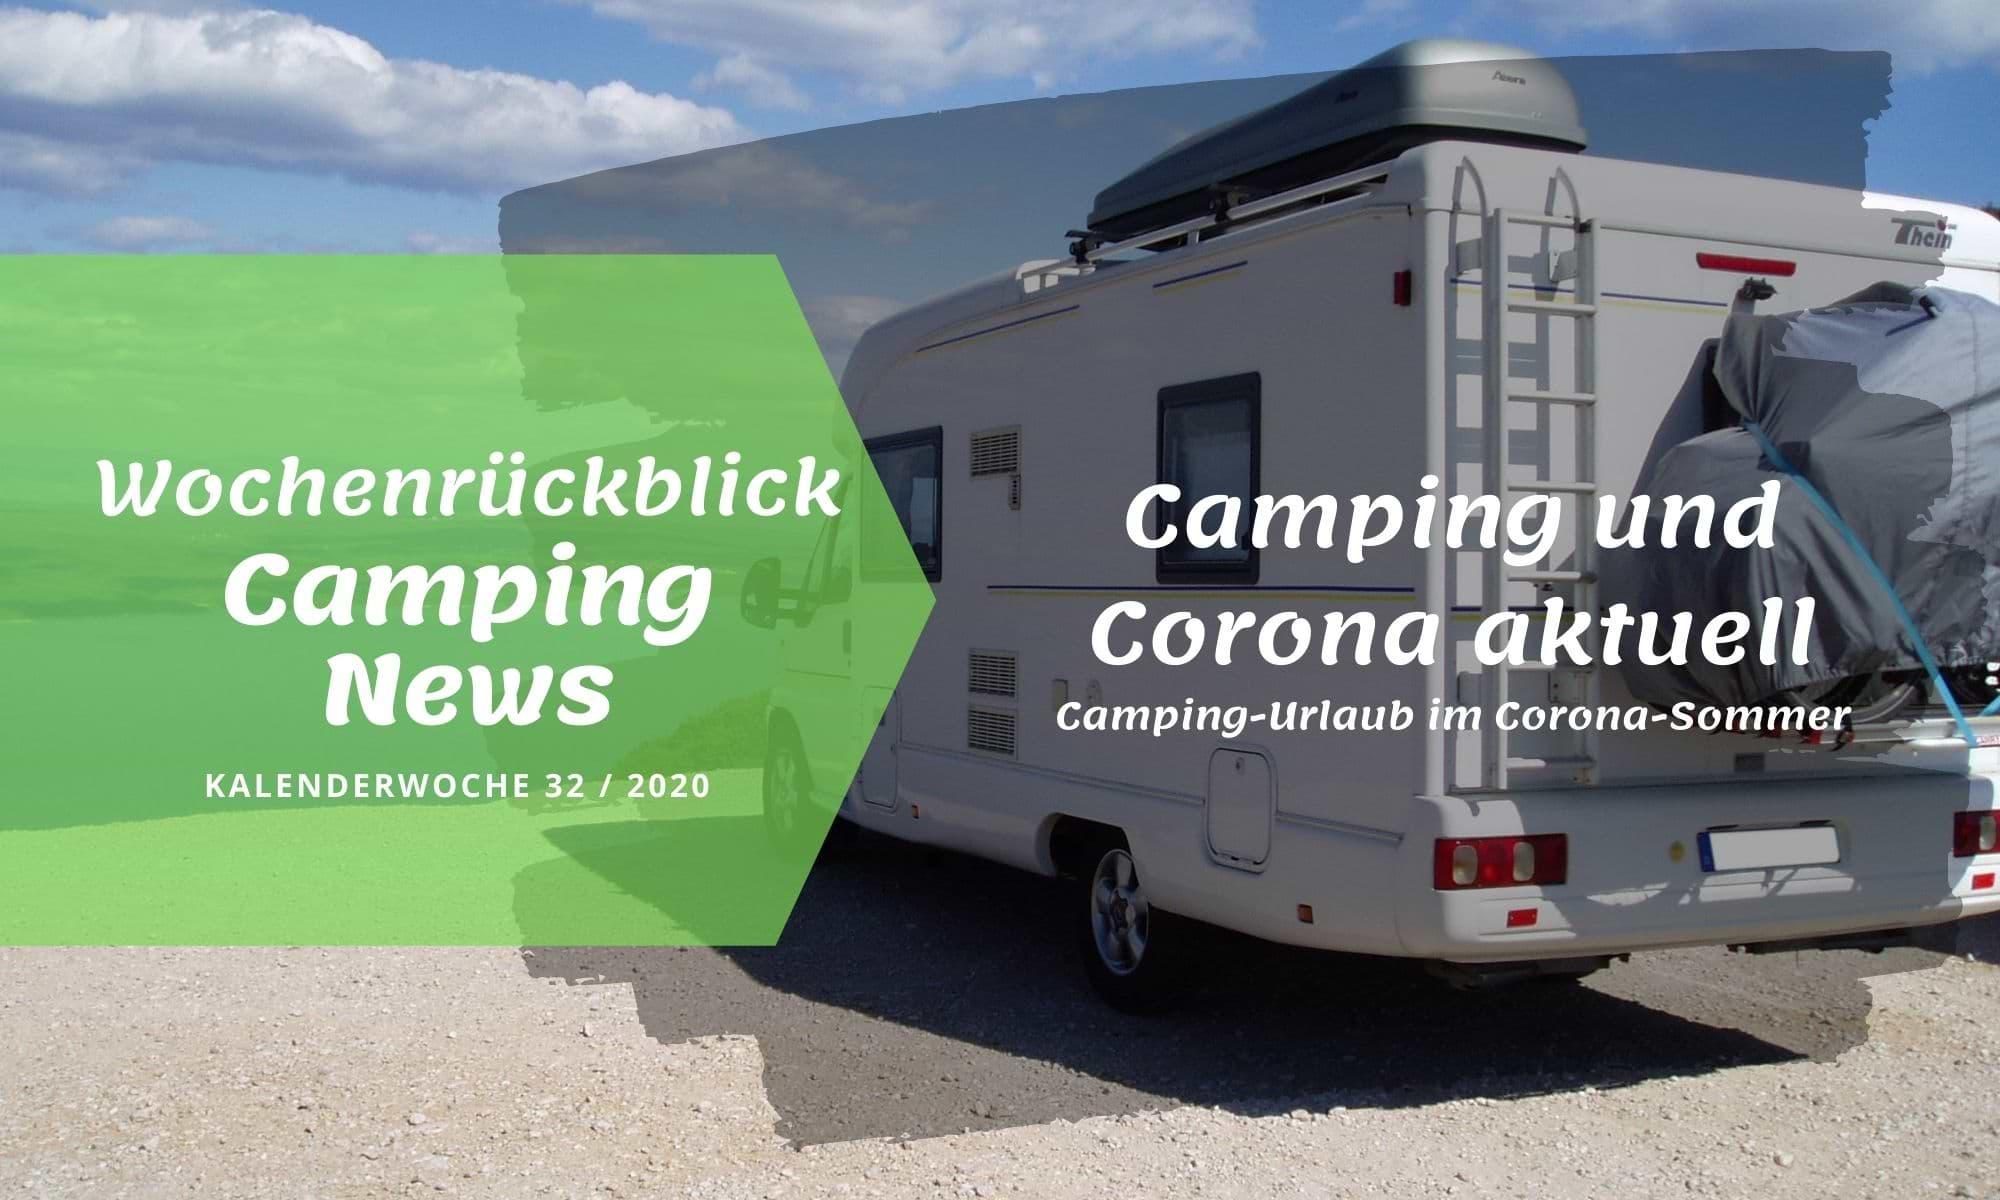 Camping und Corona aktuell